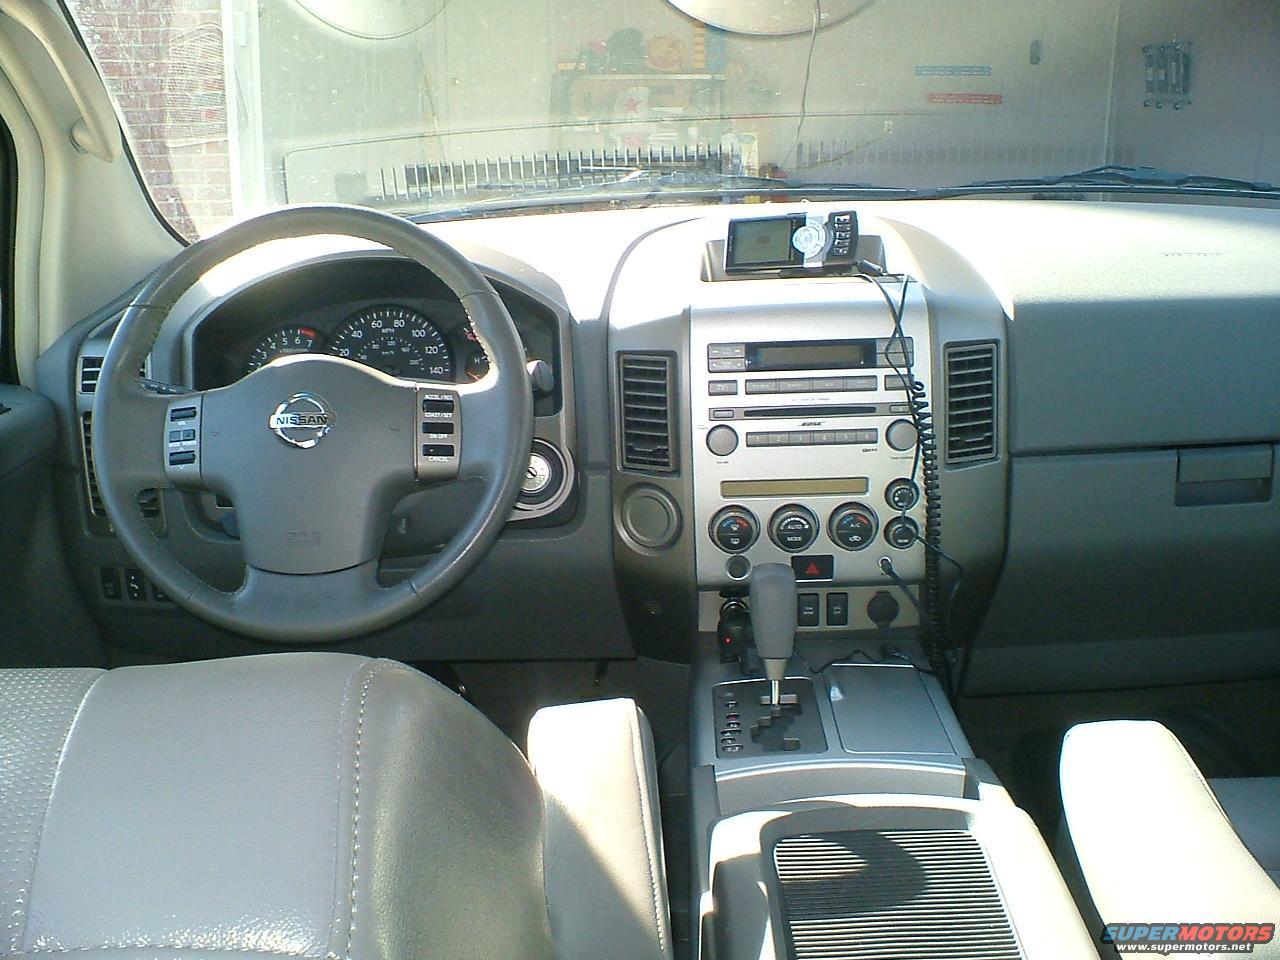 Nissan 2018 >> 2006 Nissan Armada Interior picture | SuperMotors.net